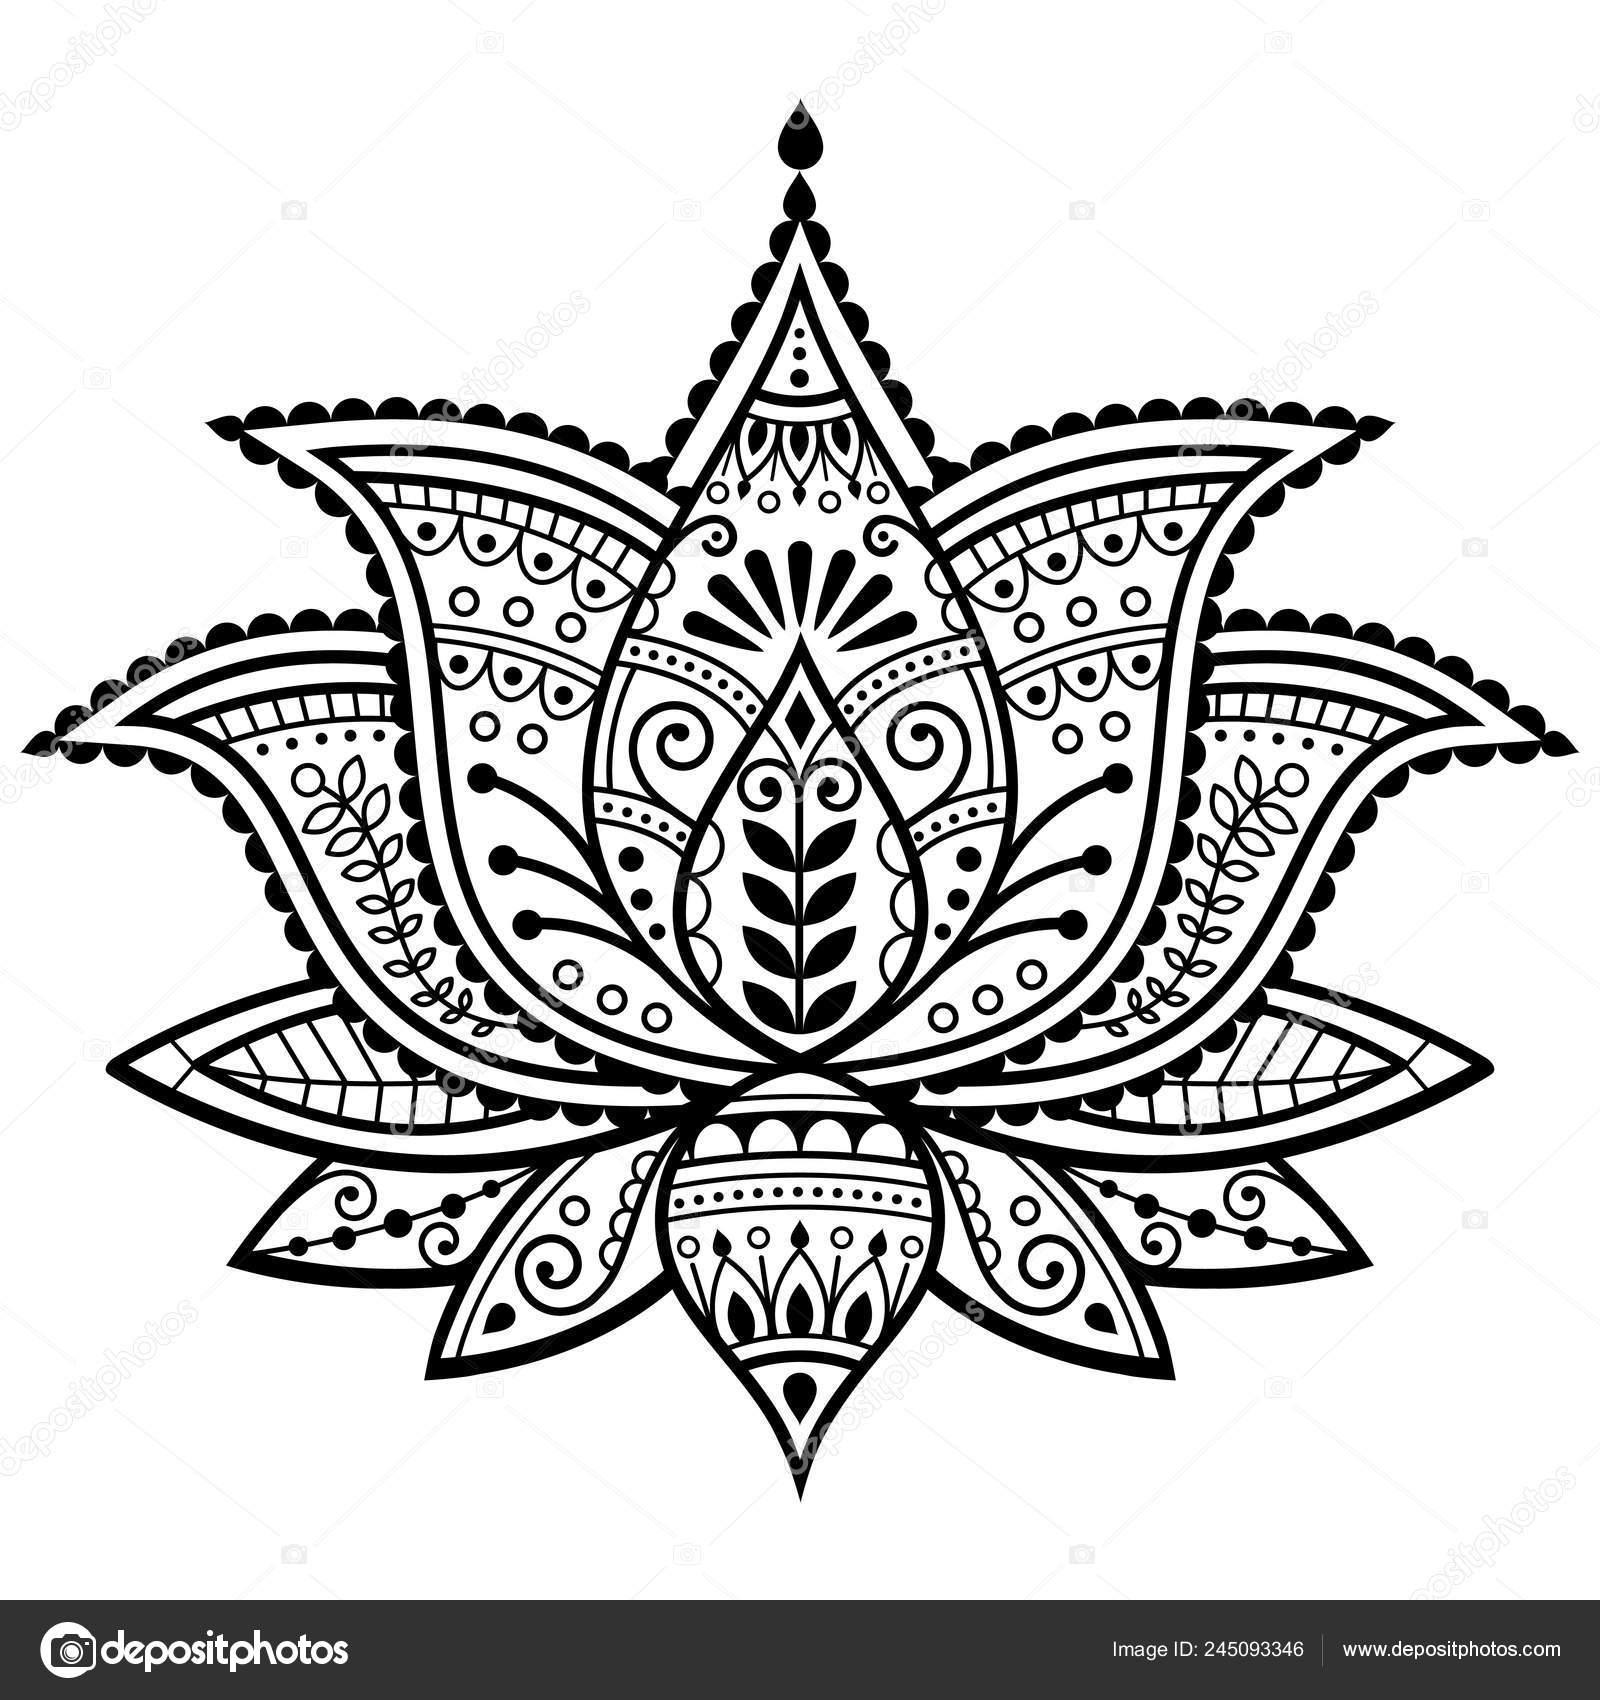 Mehndi Henna Tatuagem Desenho Vetor Flor Lótus Indiano